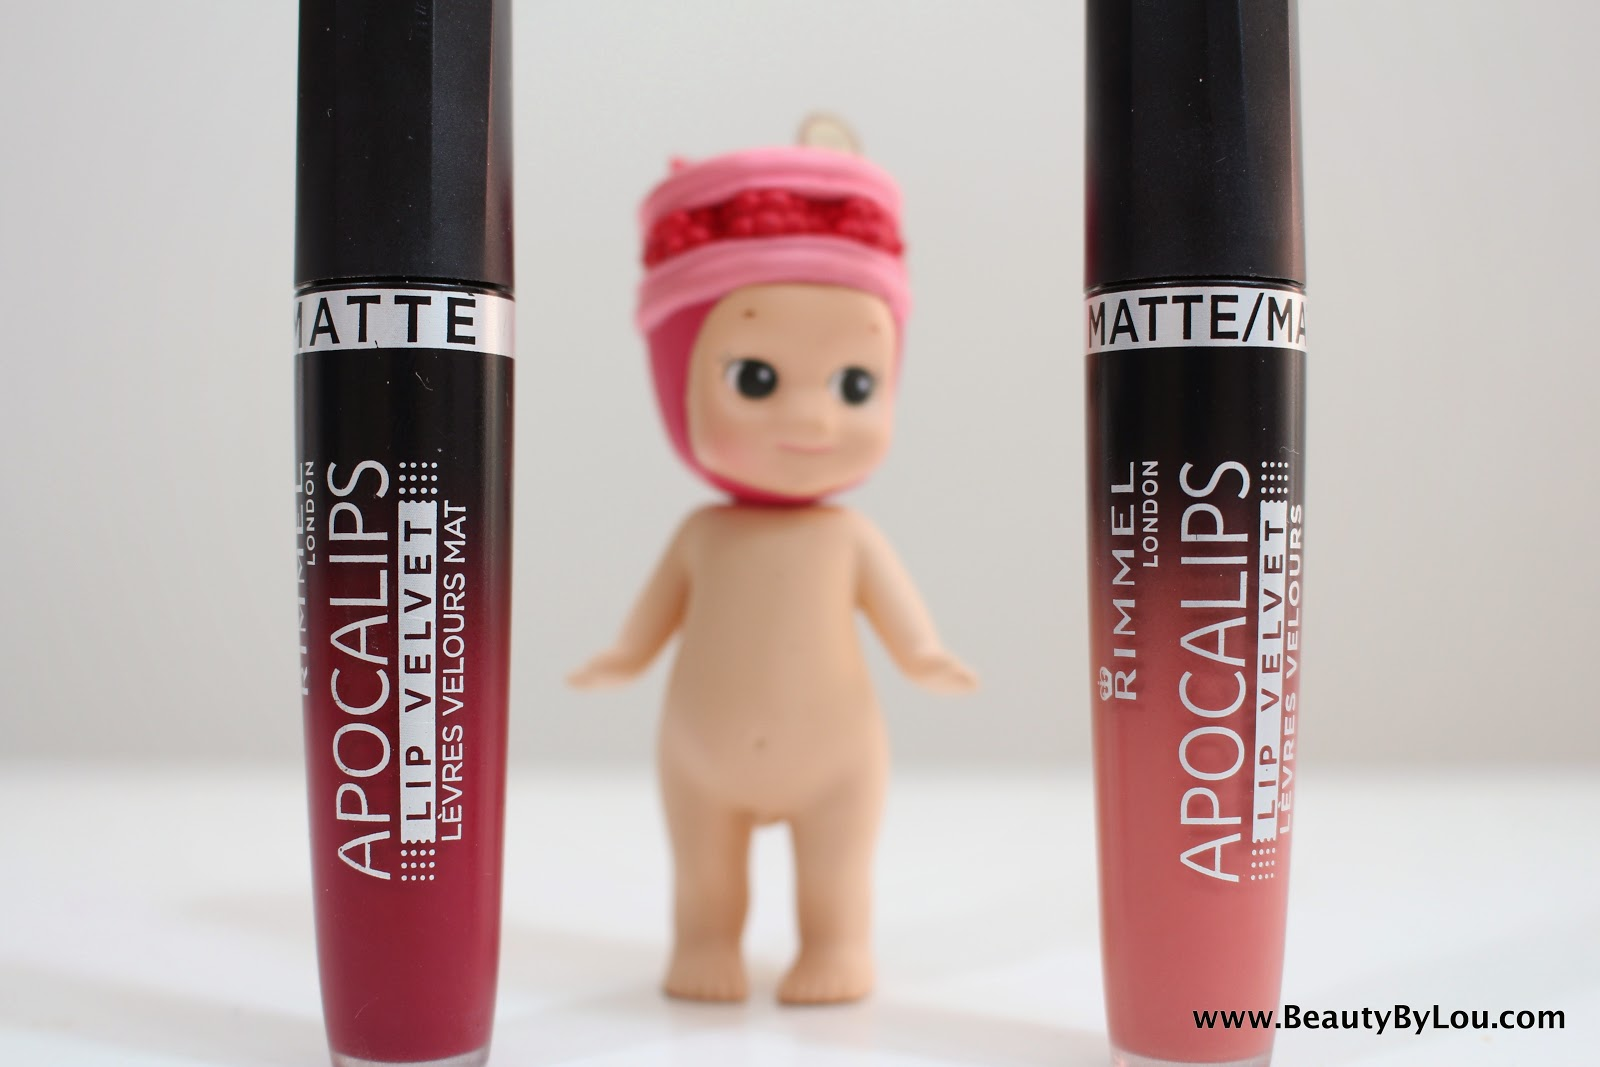 http://www.beautybylou.com/2015/04/mondays-lipstick-apocalips-matte-lipsticks-rimmel.html